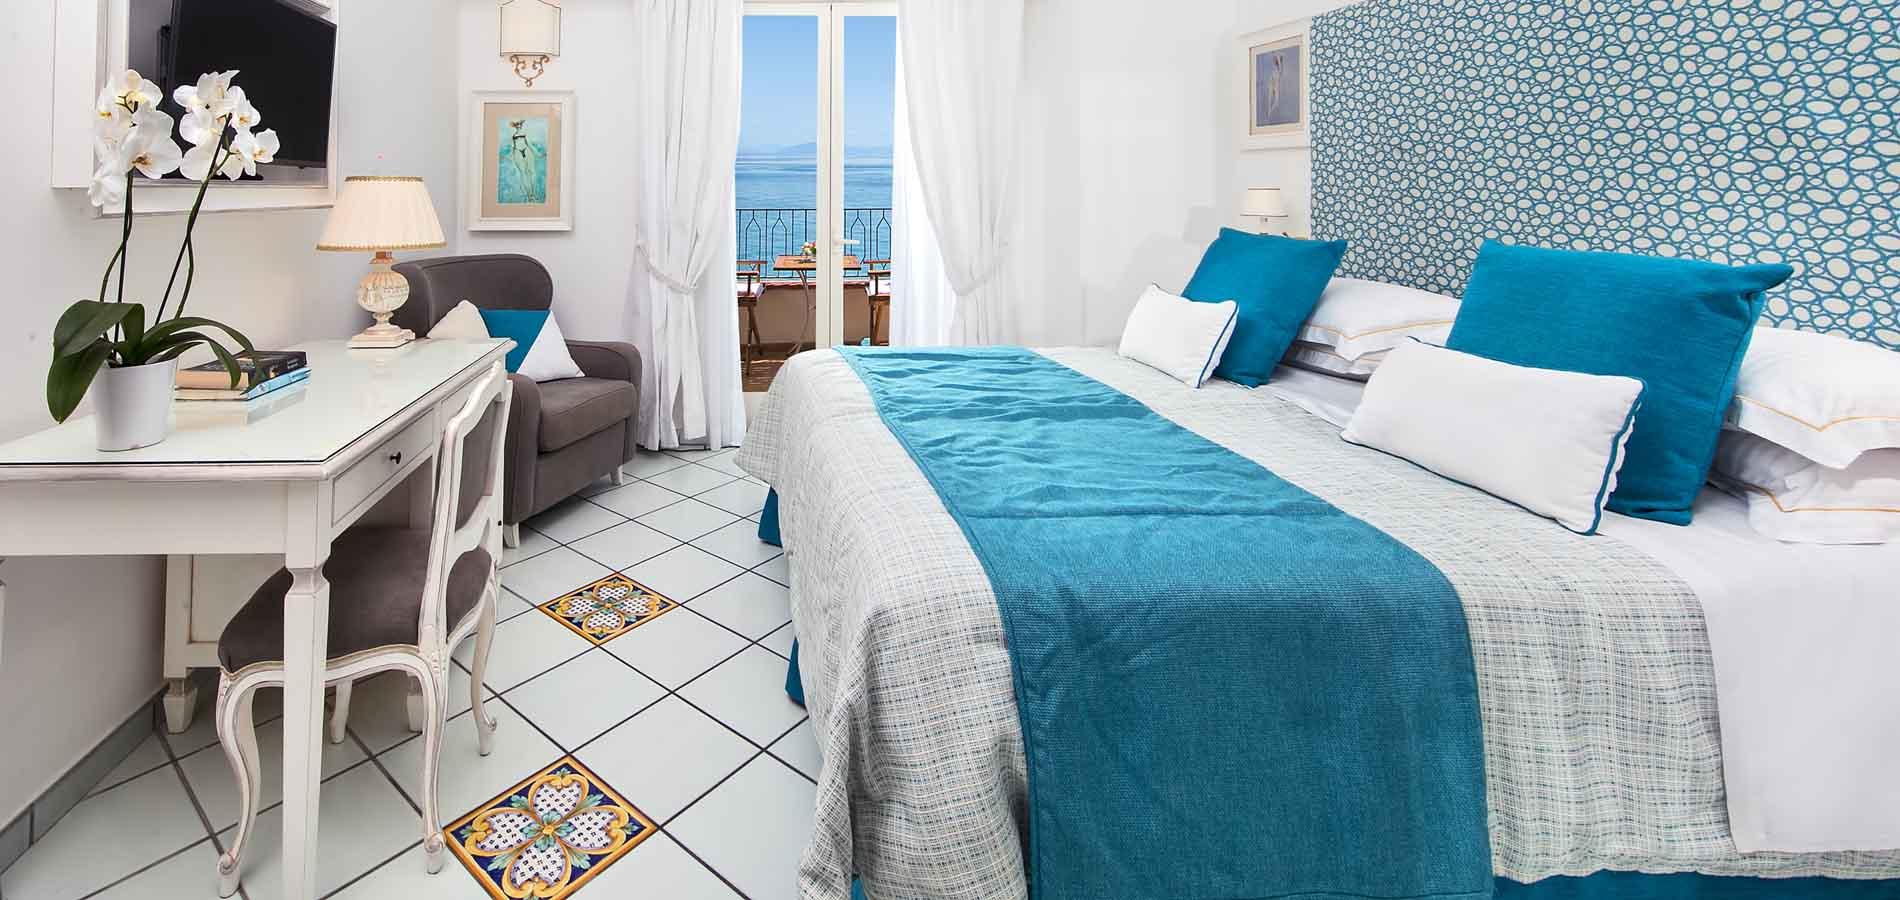 positano hotels amalfi coast – hotel onda verde 7 km from positano